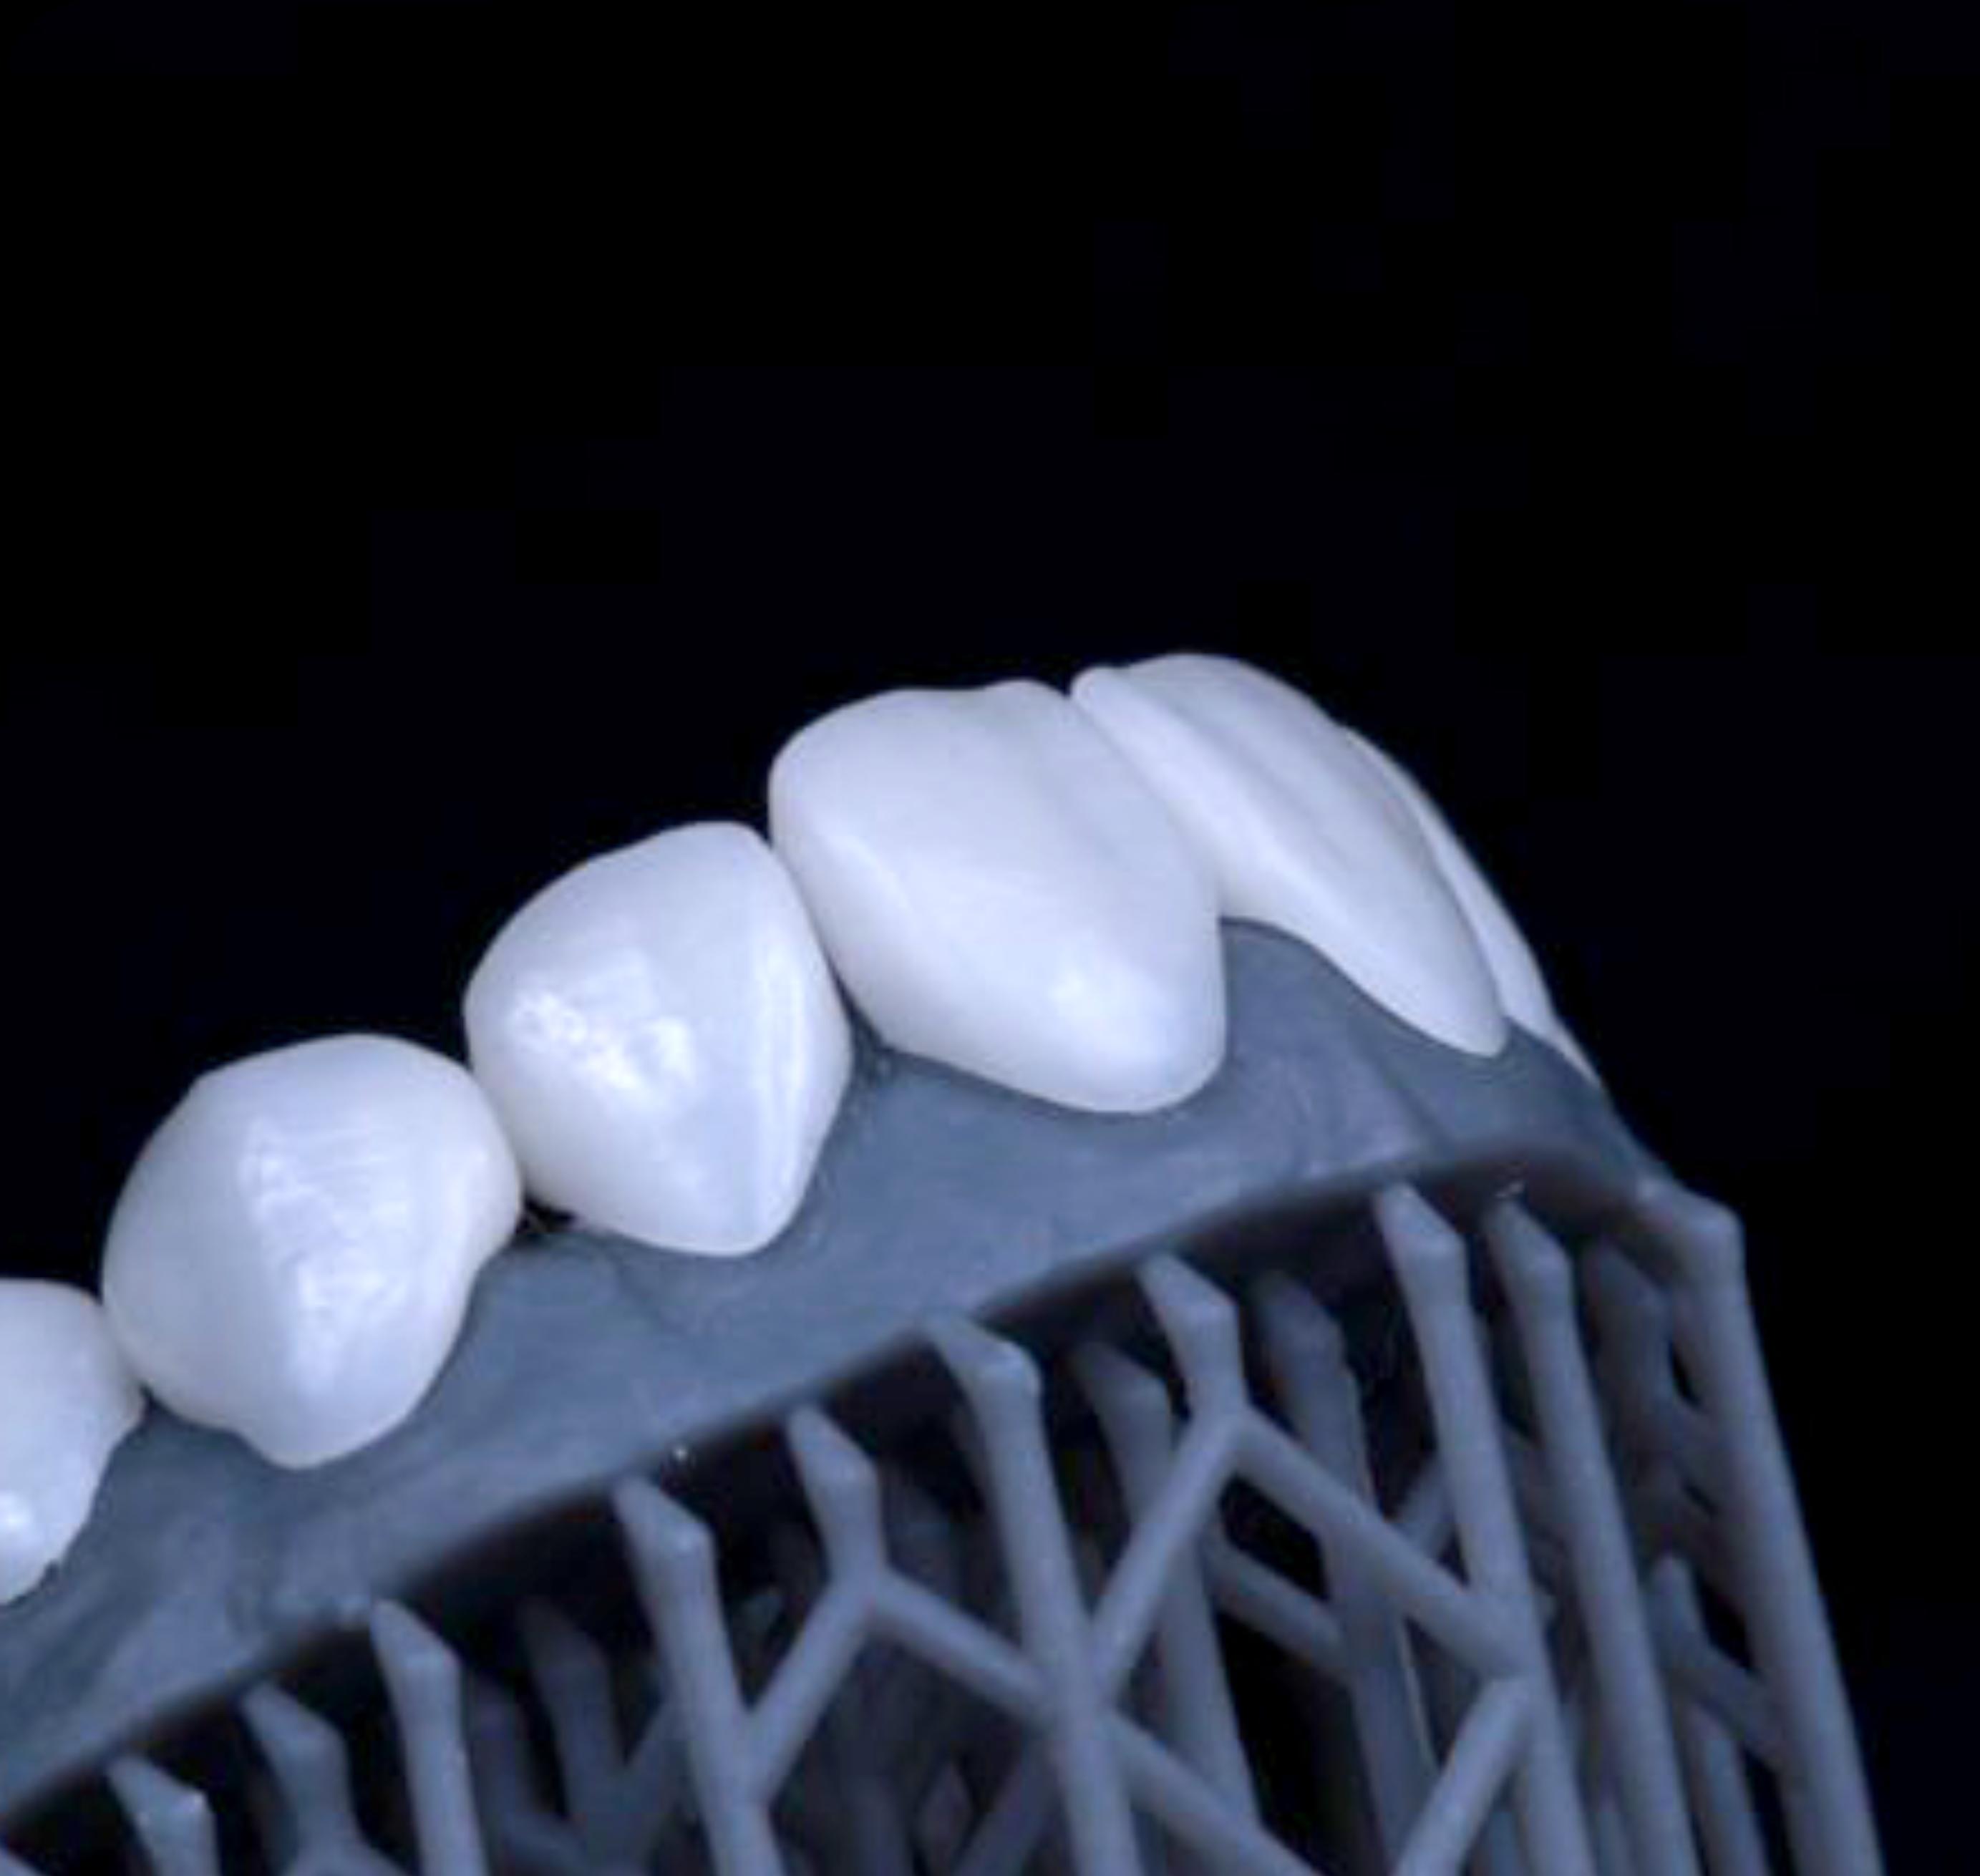 A natural-looking dental restoration created using Digital Smile Design.